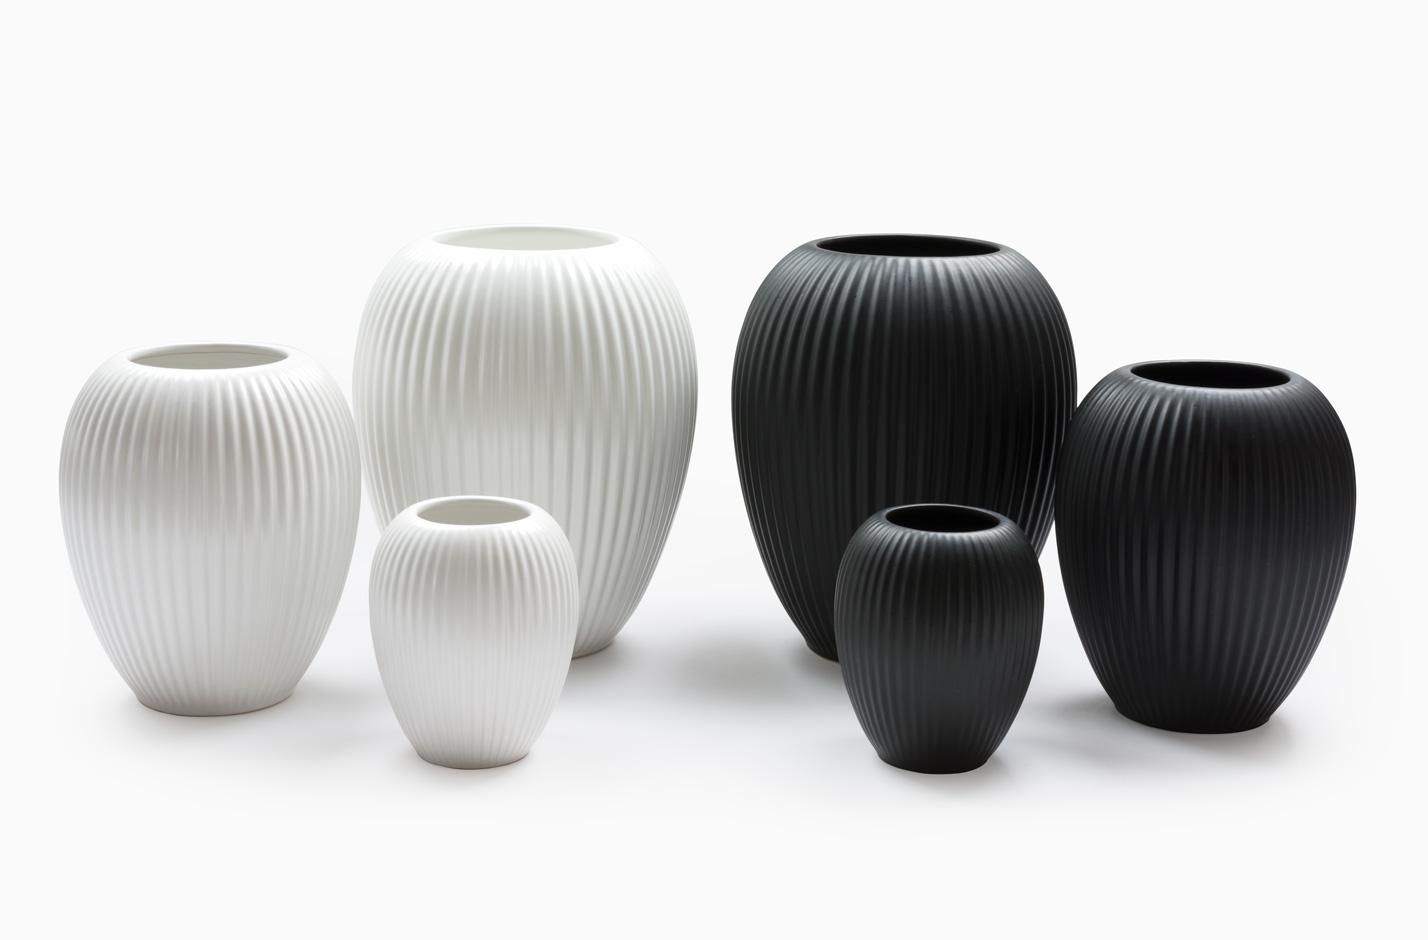 Michael Andersen Keramik Vaser 4767 3 Sorte og 3 Hvide